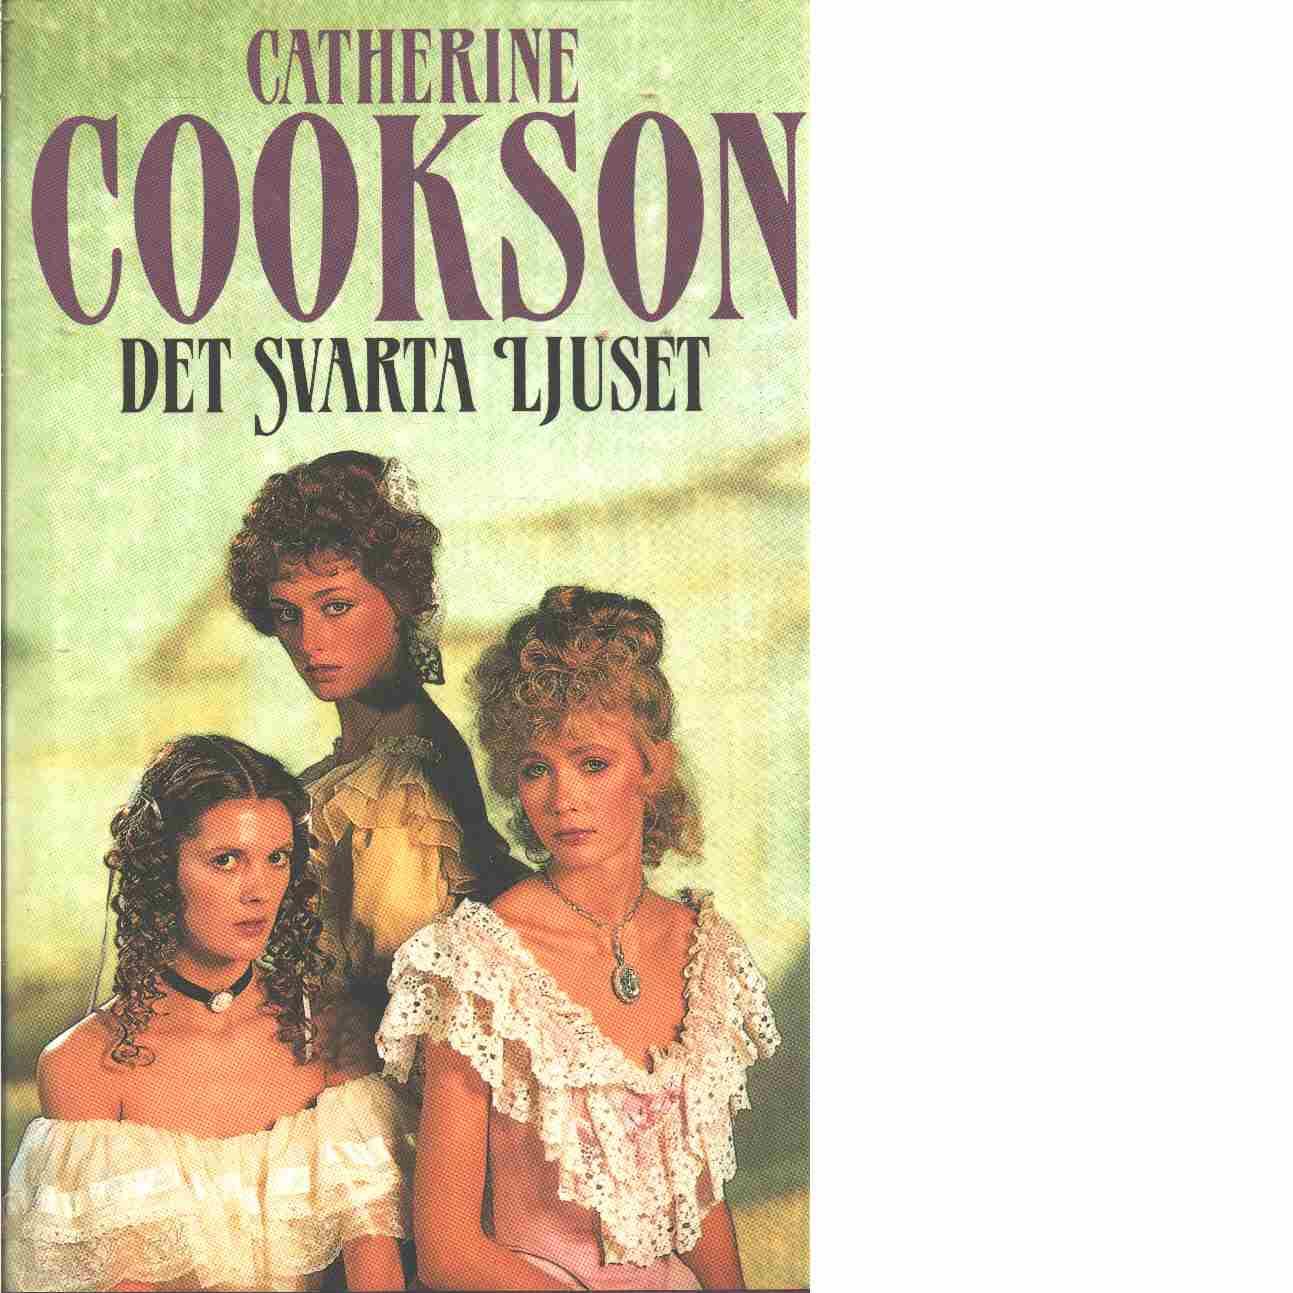 Det svarta ljuset  - Cookson, Catherine